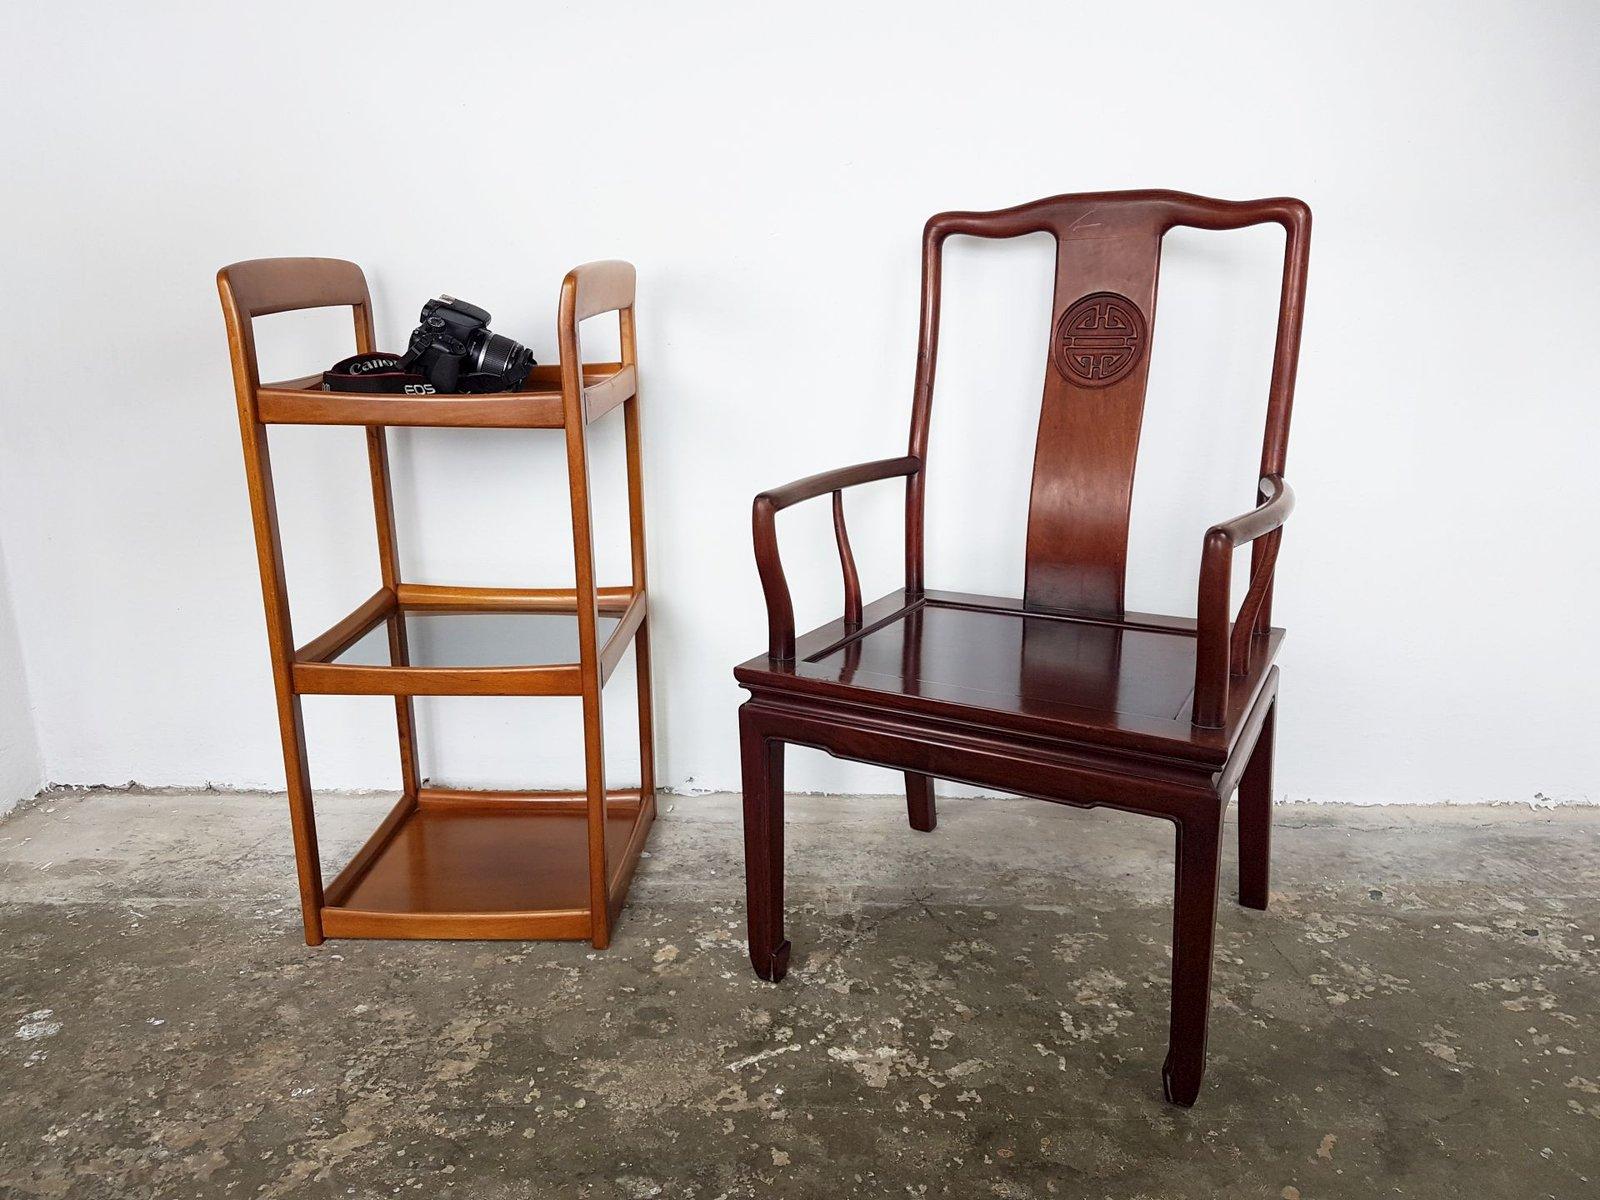 Scrivania Vintage Usata : Vendita sedie da scrivania ~ bukadar.info = galleria di sedie foto e